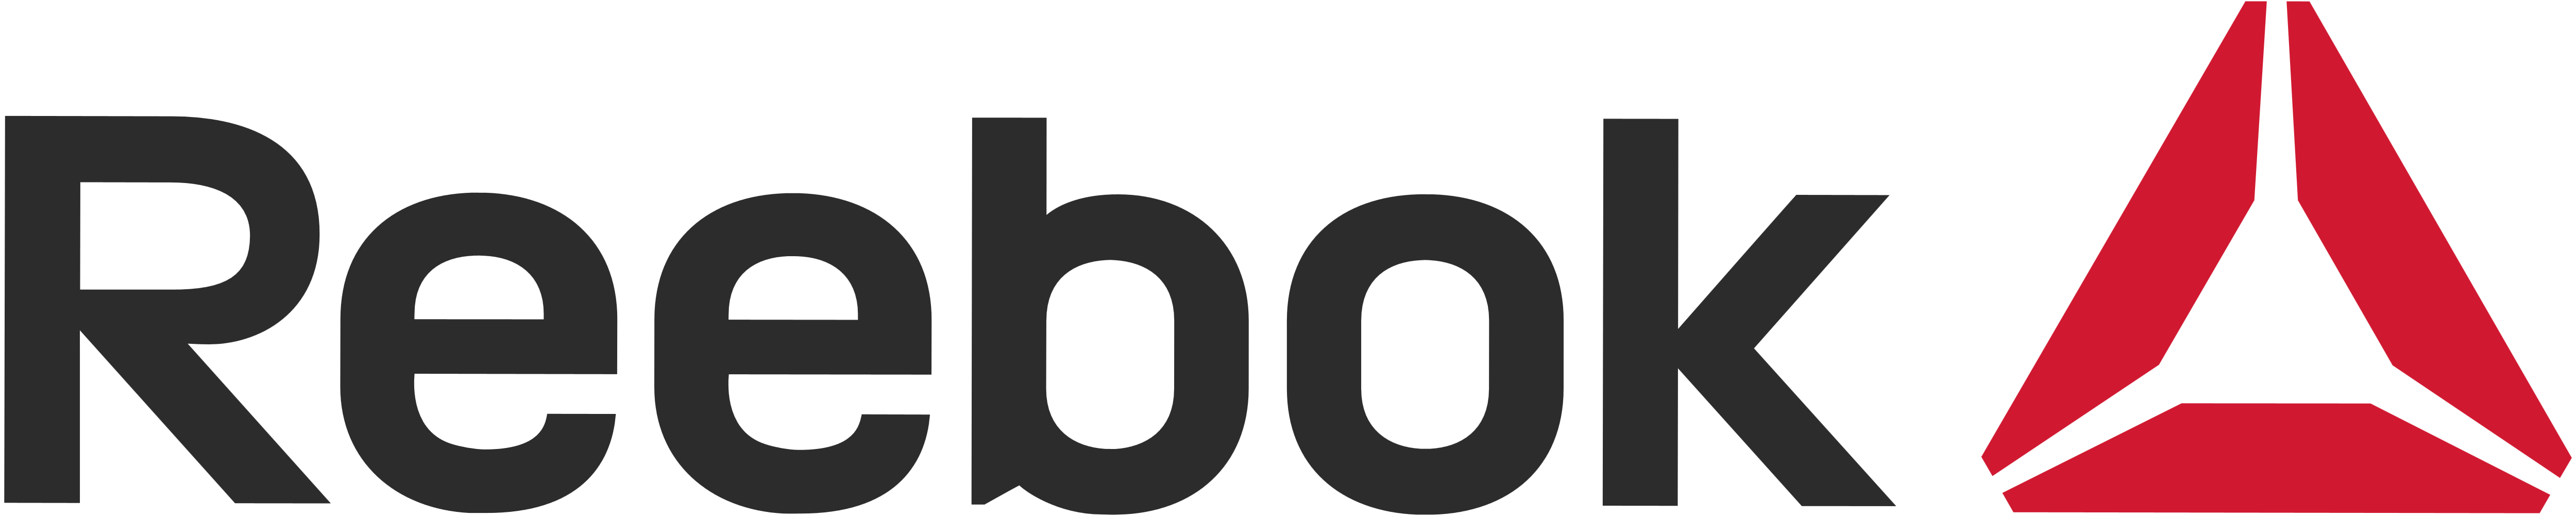 reebok logo transparent png stickpng